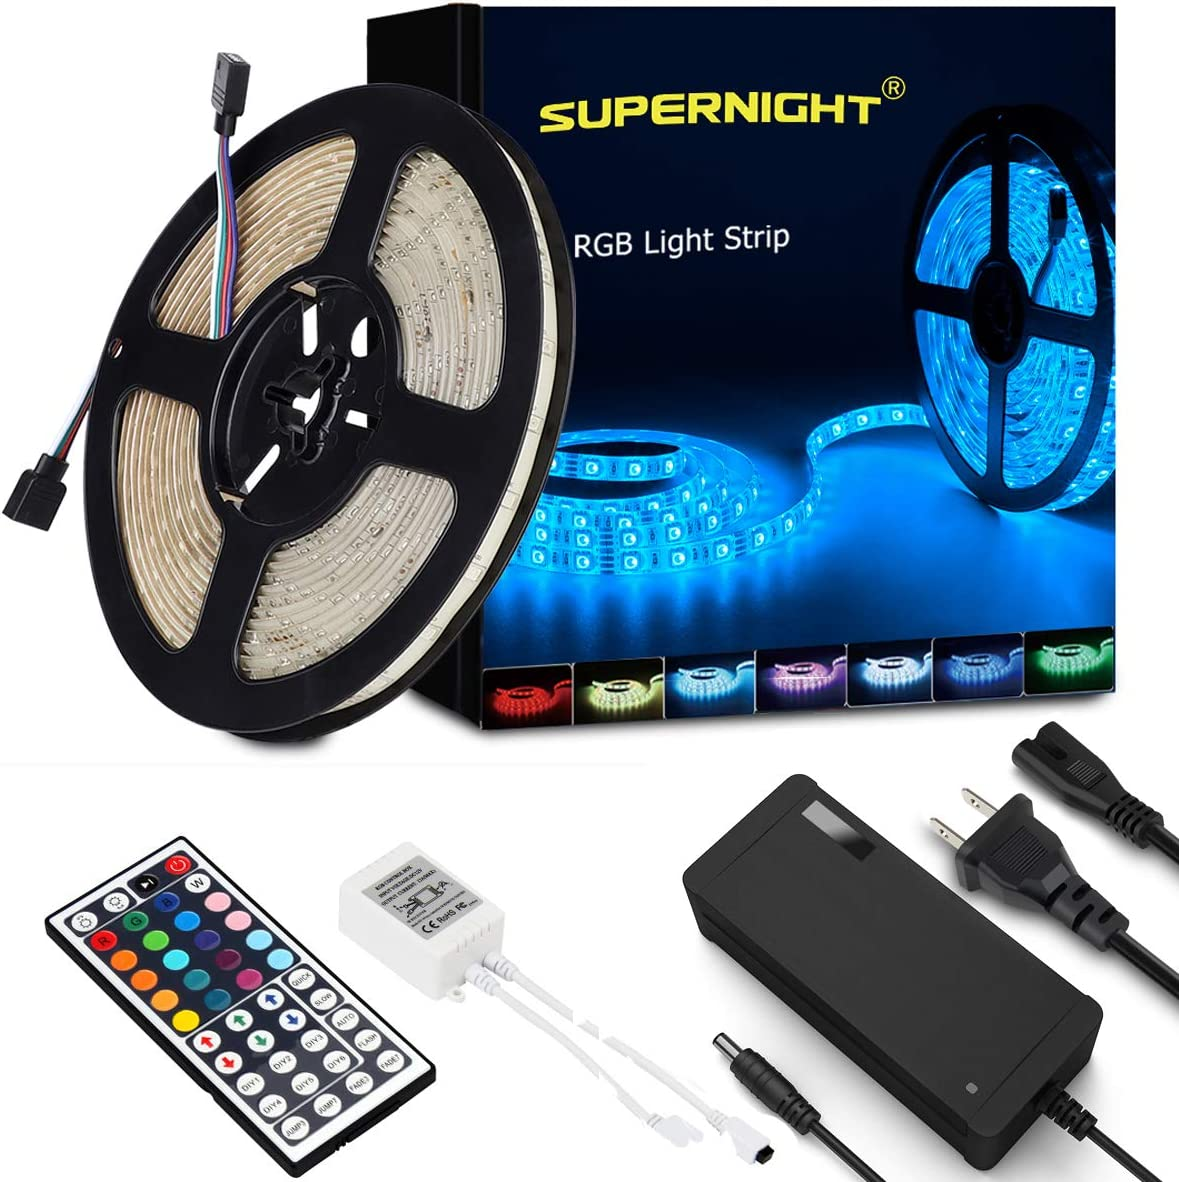 Supernight RGB LED Light Strip